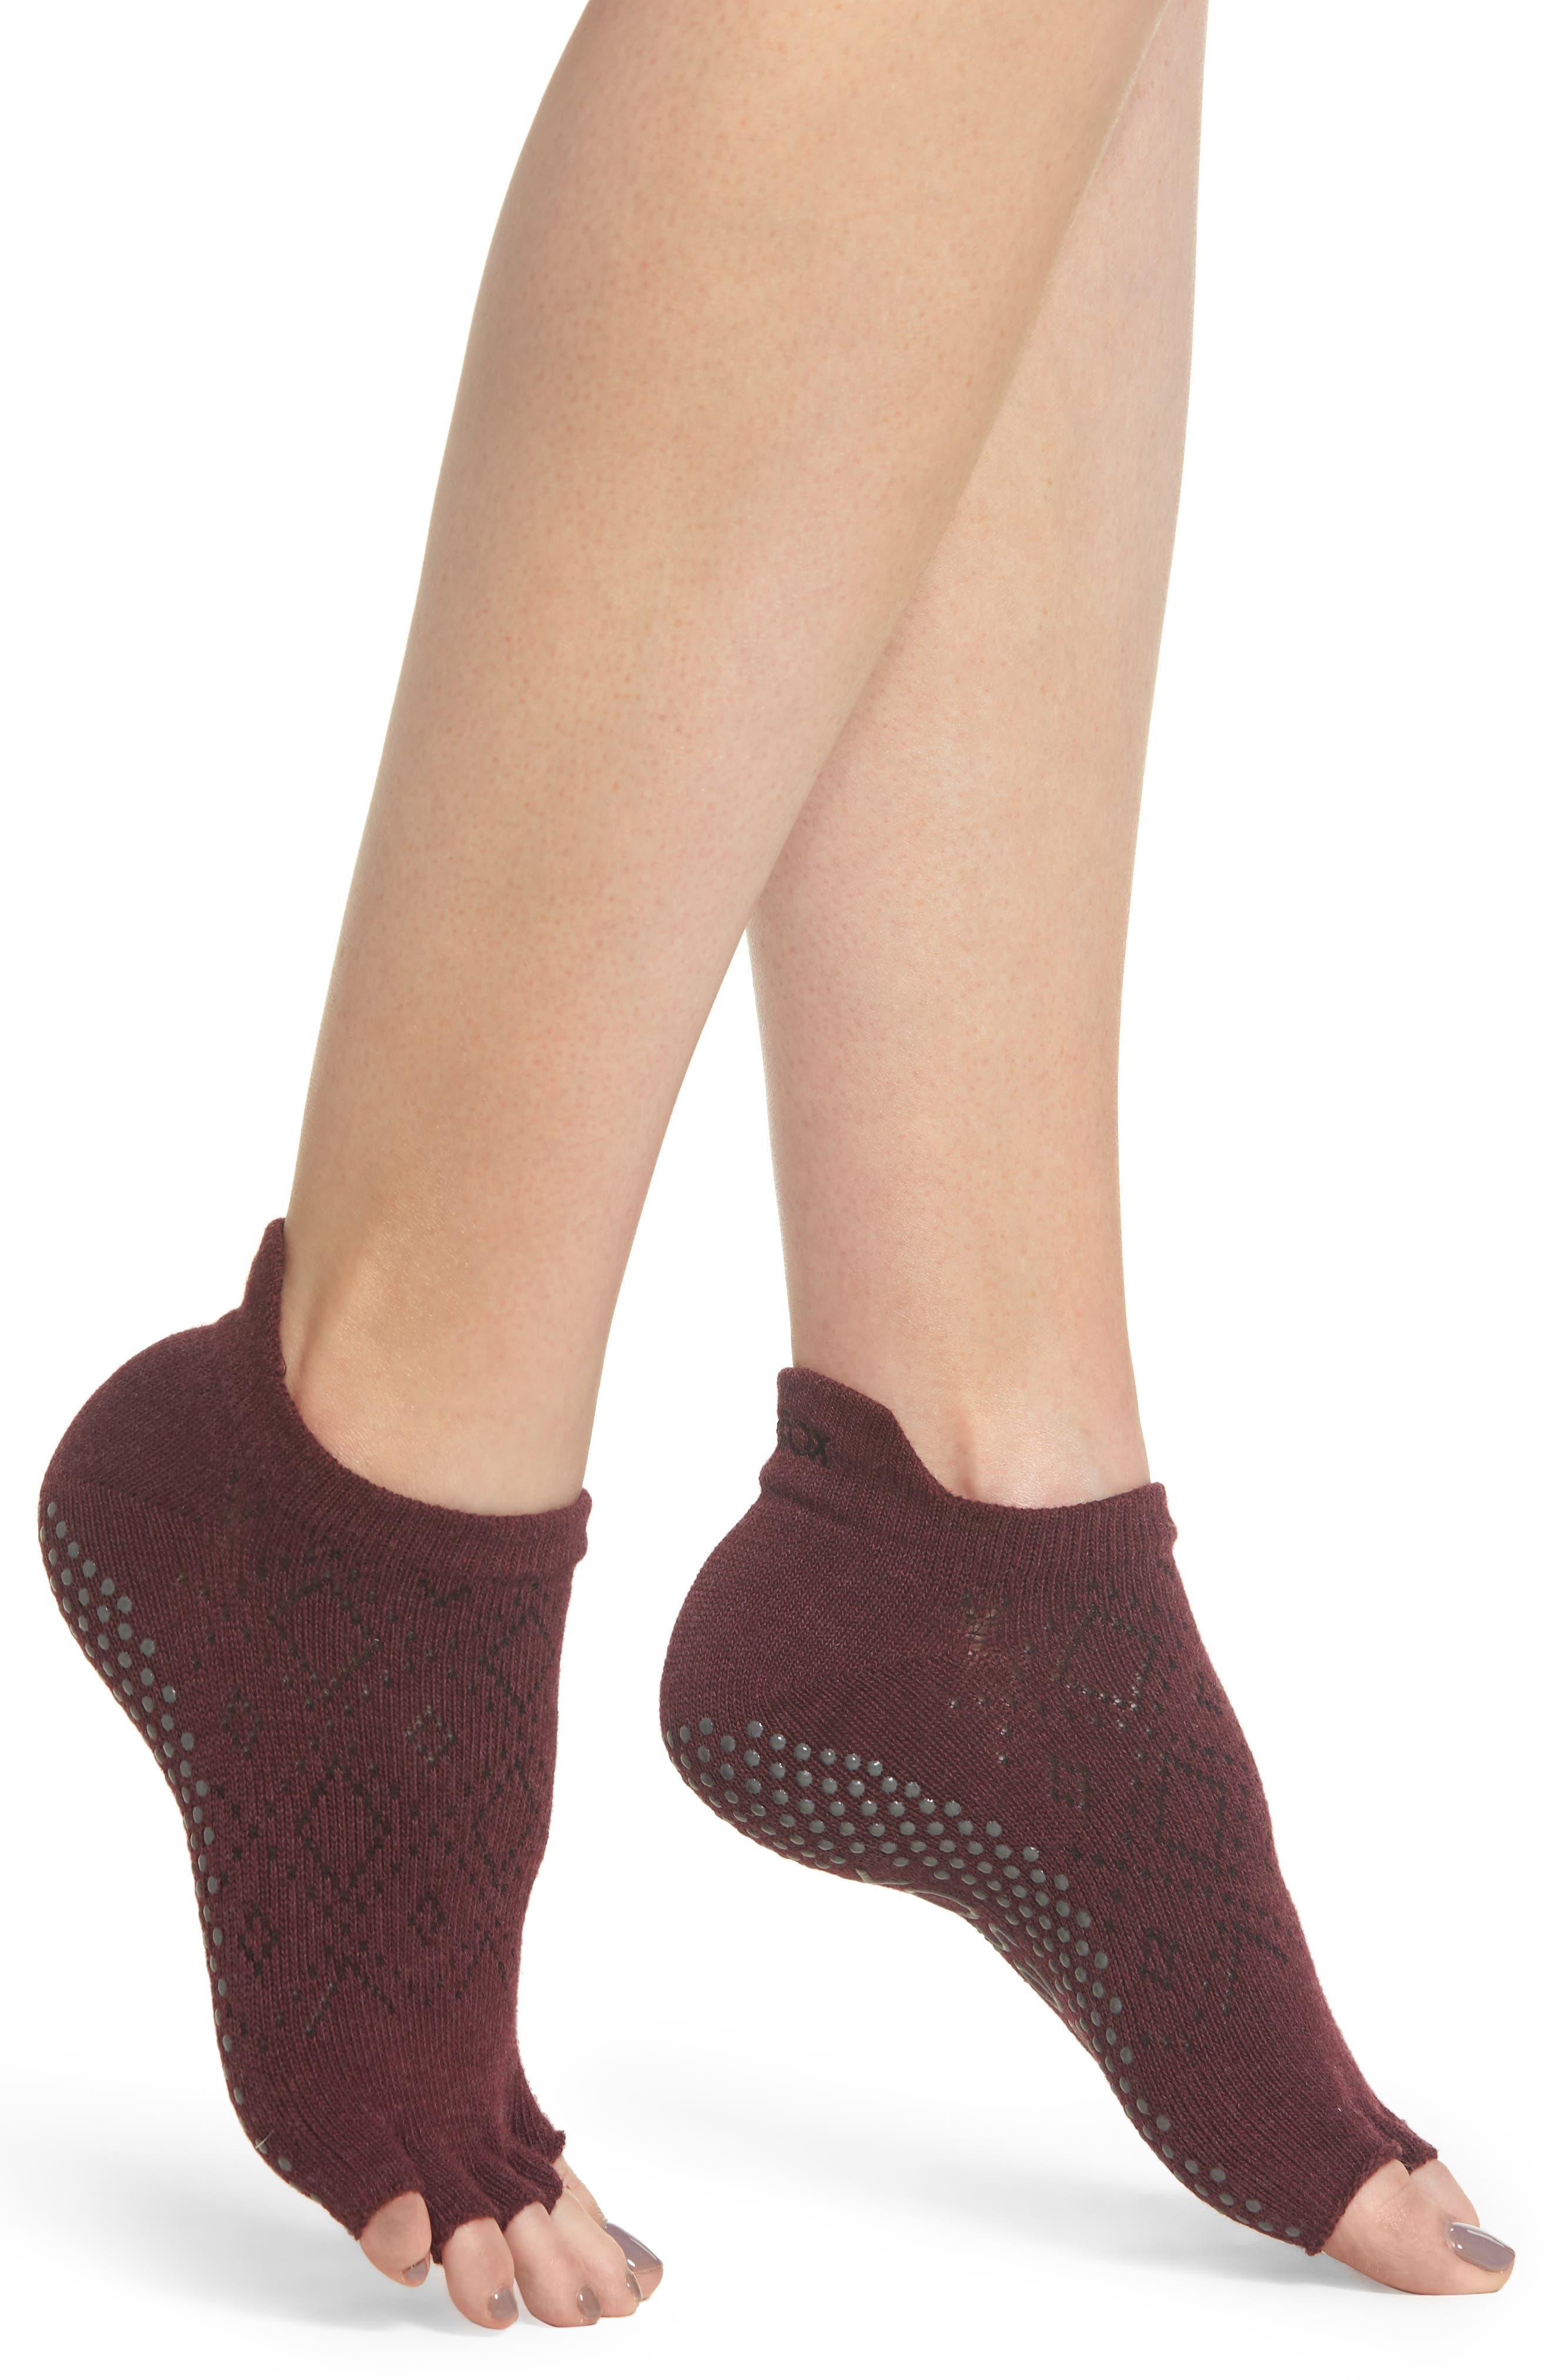 Low Rise Half-Toe Gripper Socks,                         Main,                         color, VIXEN